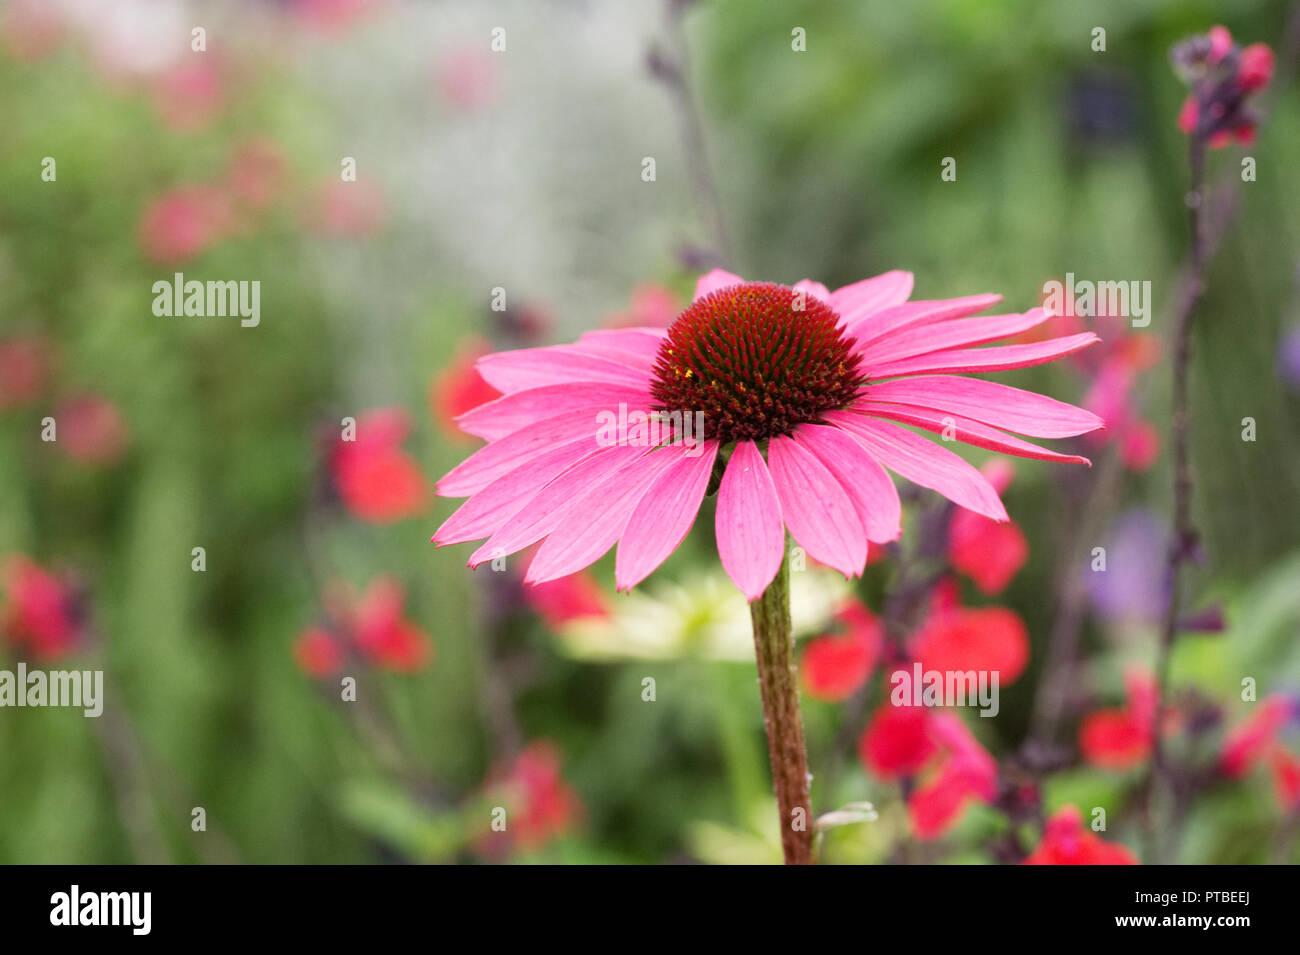 Echinacea purpurea and Salvia flowers. Stock Photo